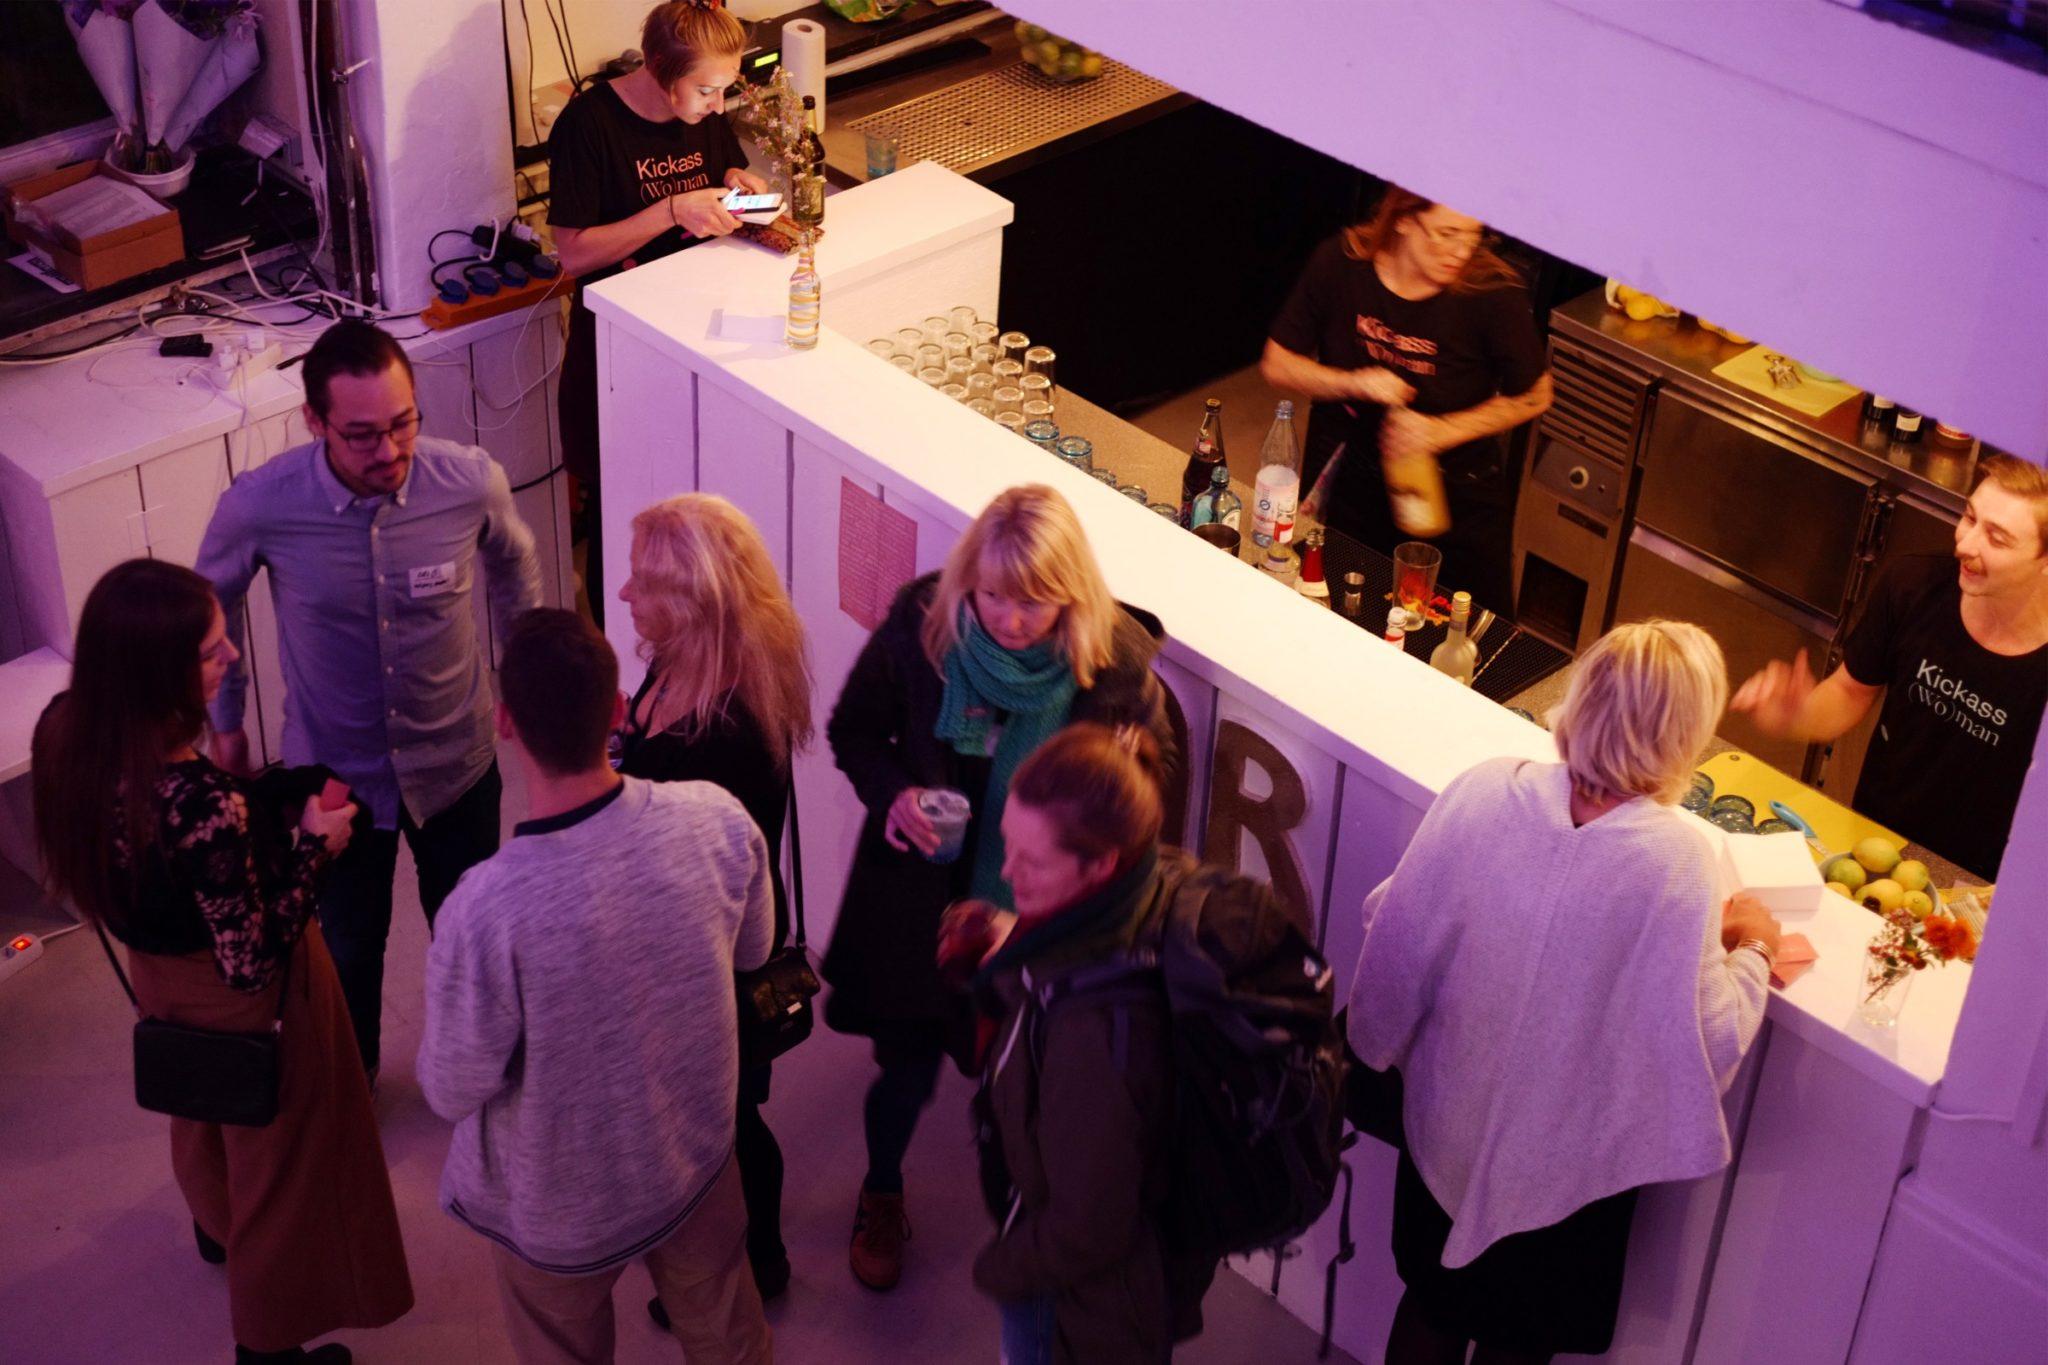 CelebratingKickassWomen Networking 25.10.18 16